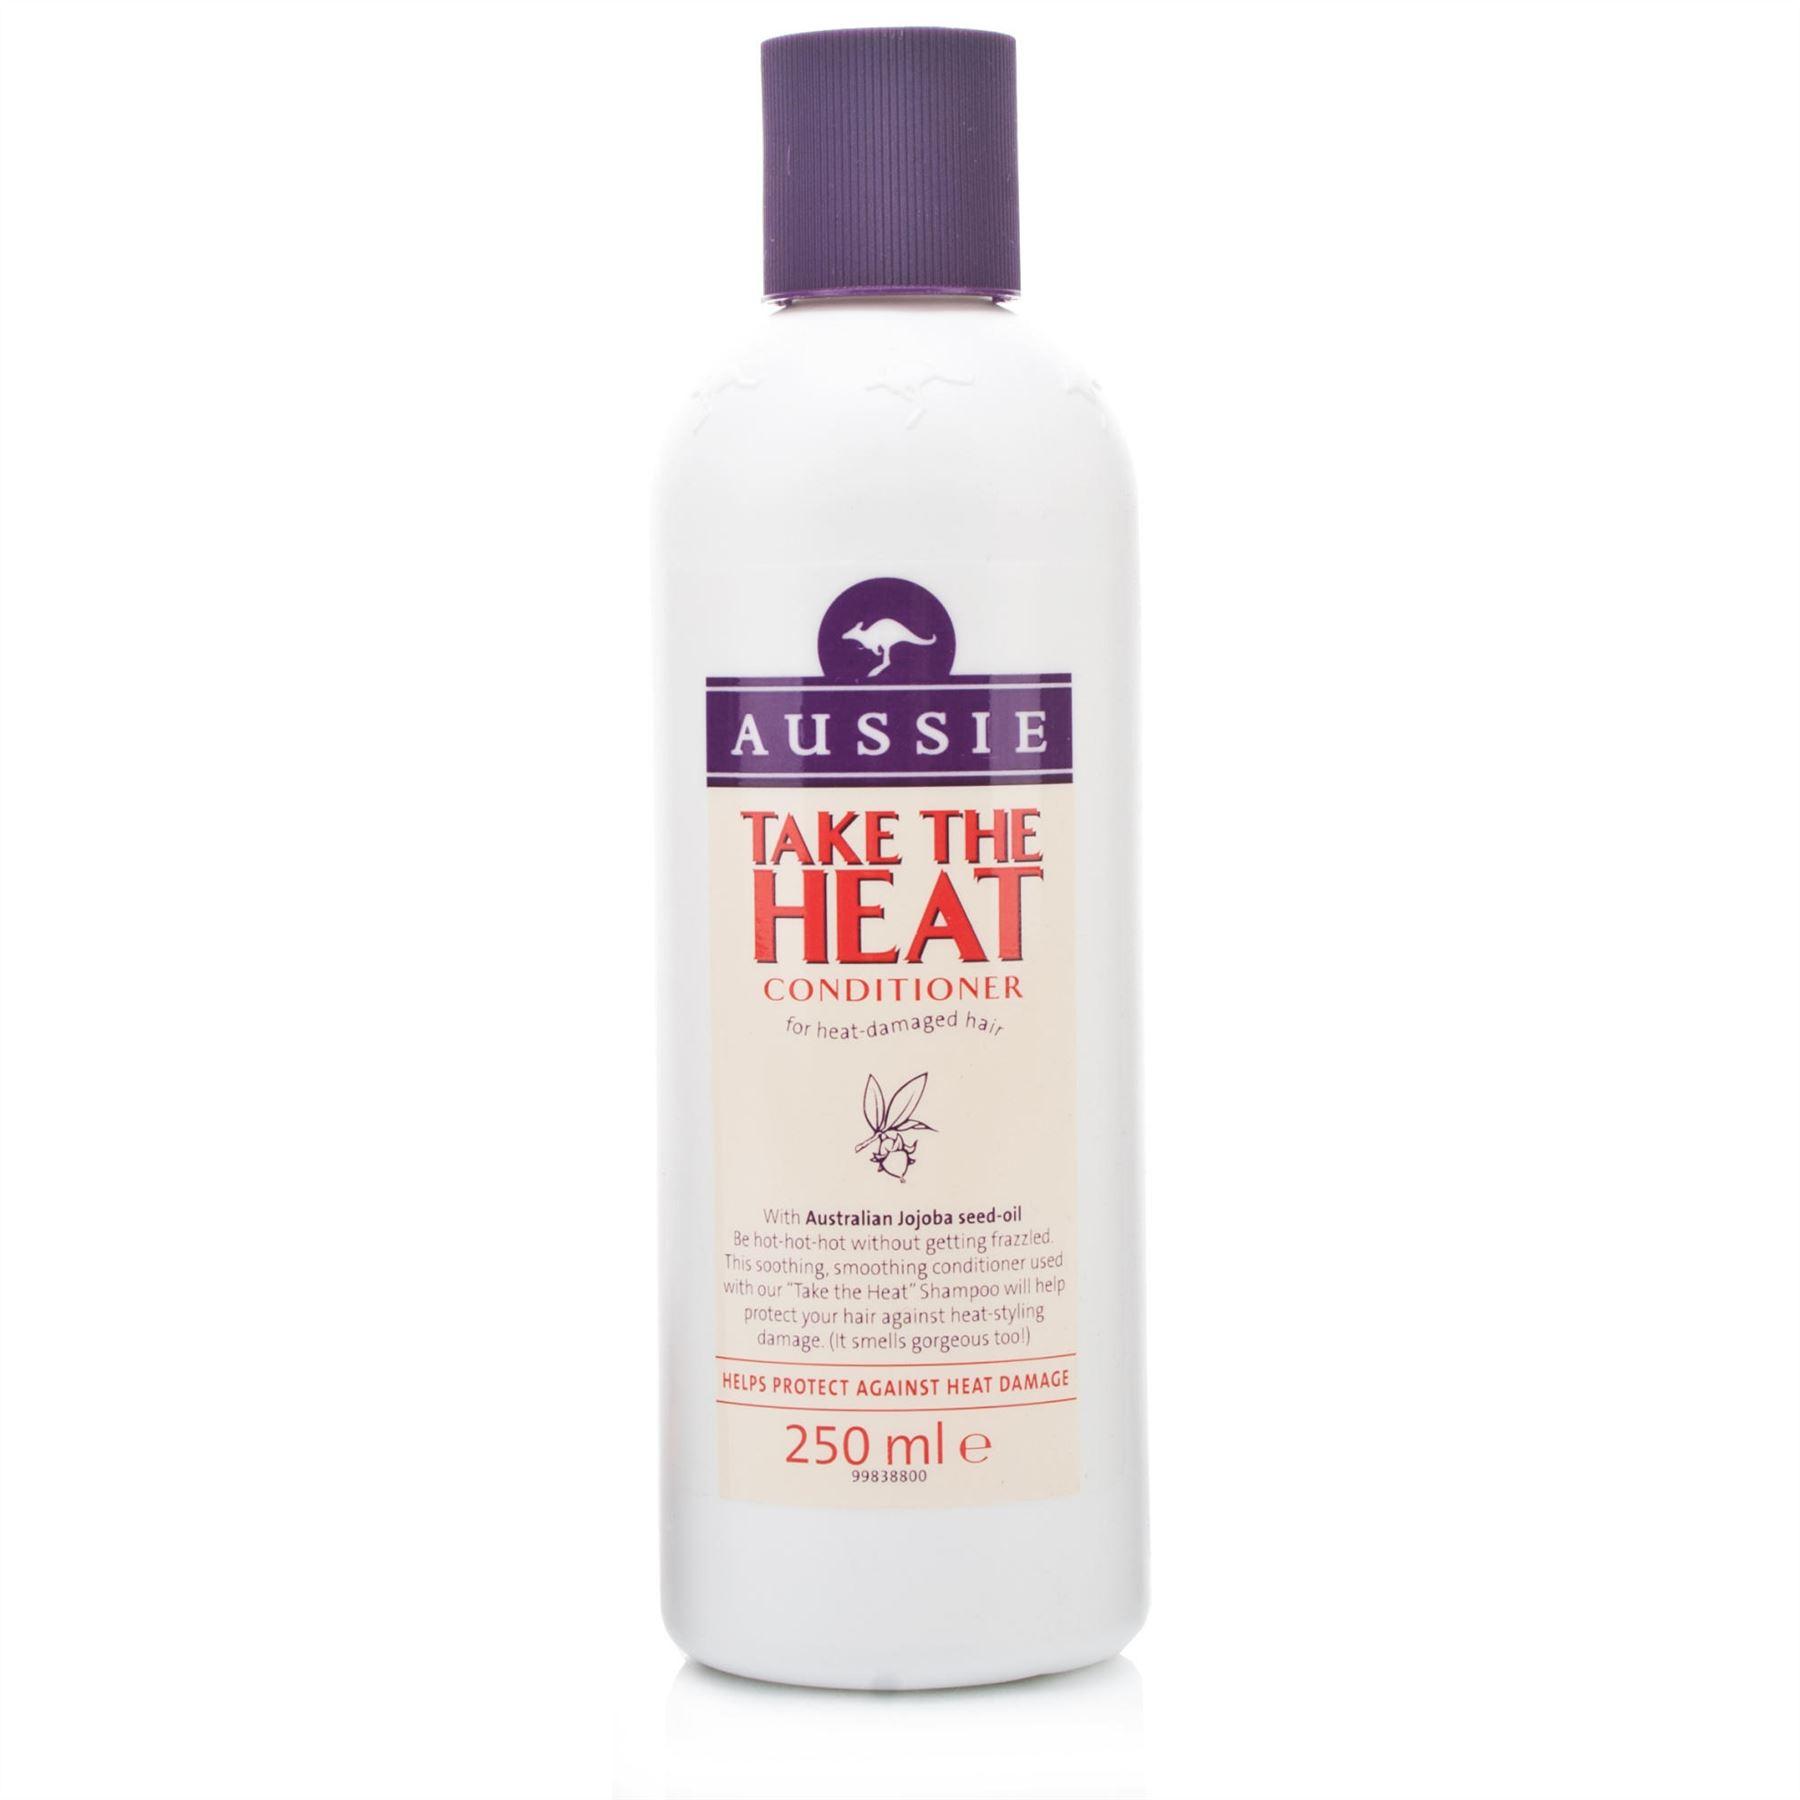 Aussie-3-Minute-Miracle-Take-the-Heat-Treatment-250ml-1-2-3-6-Packs